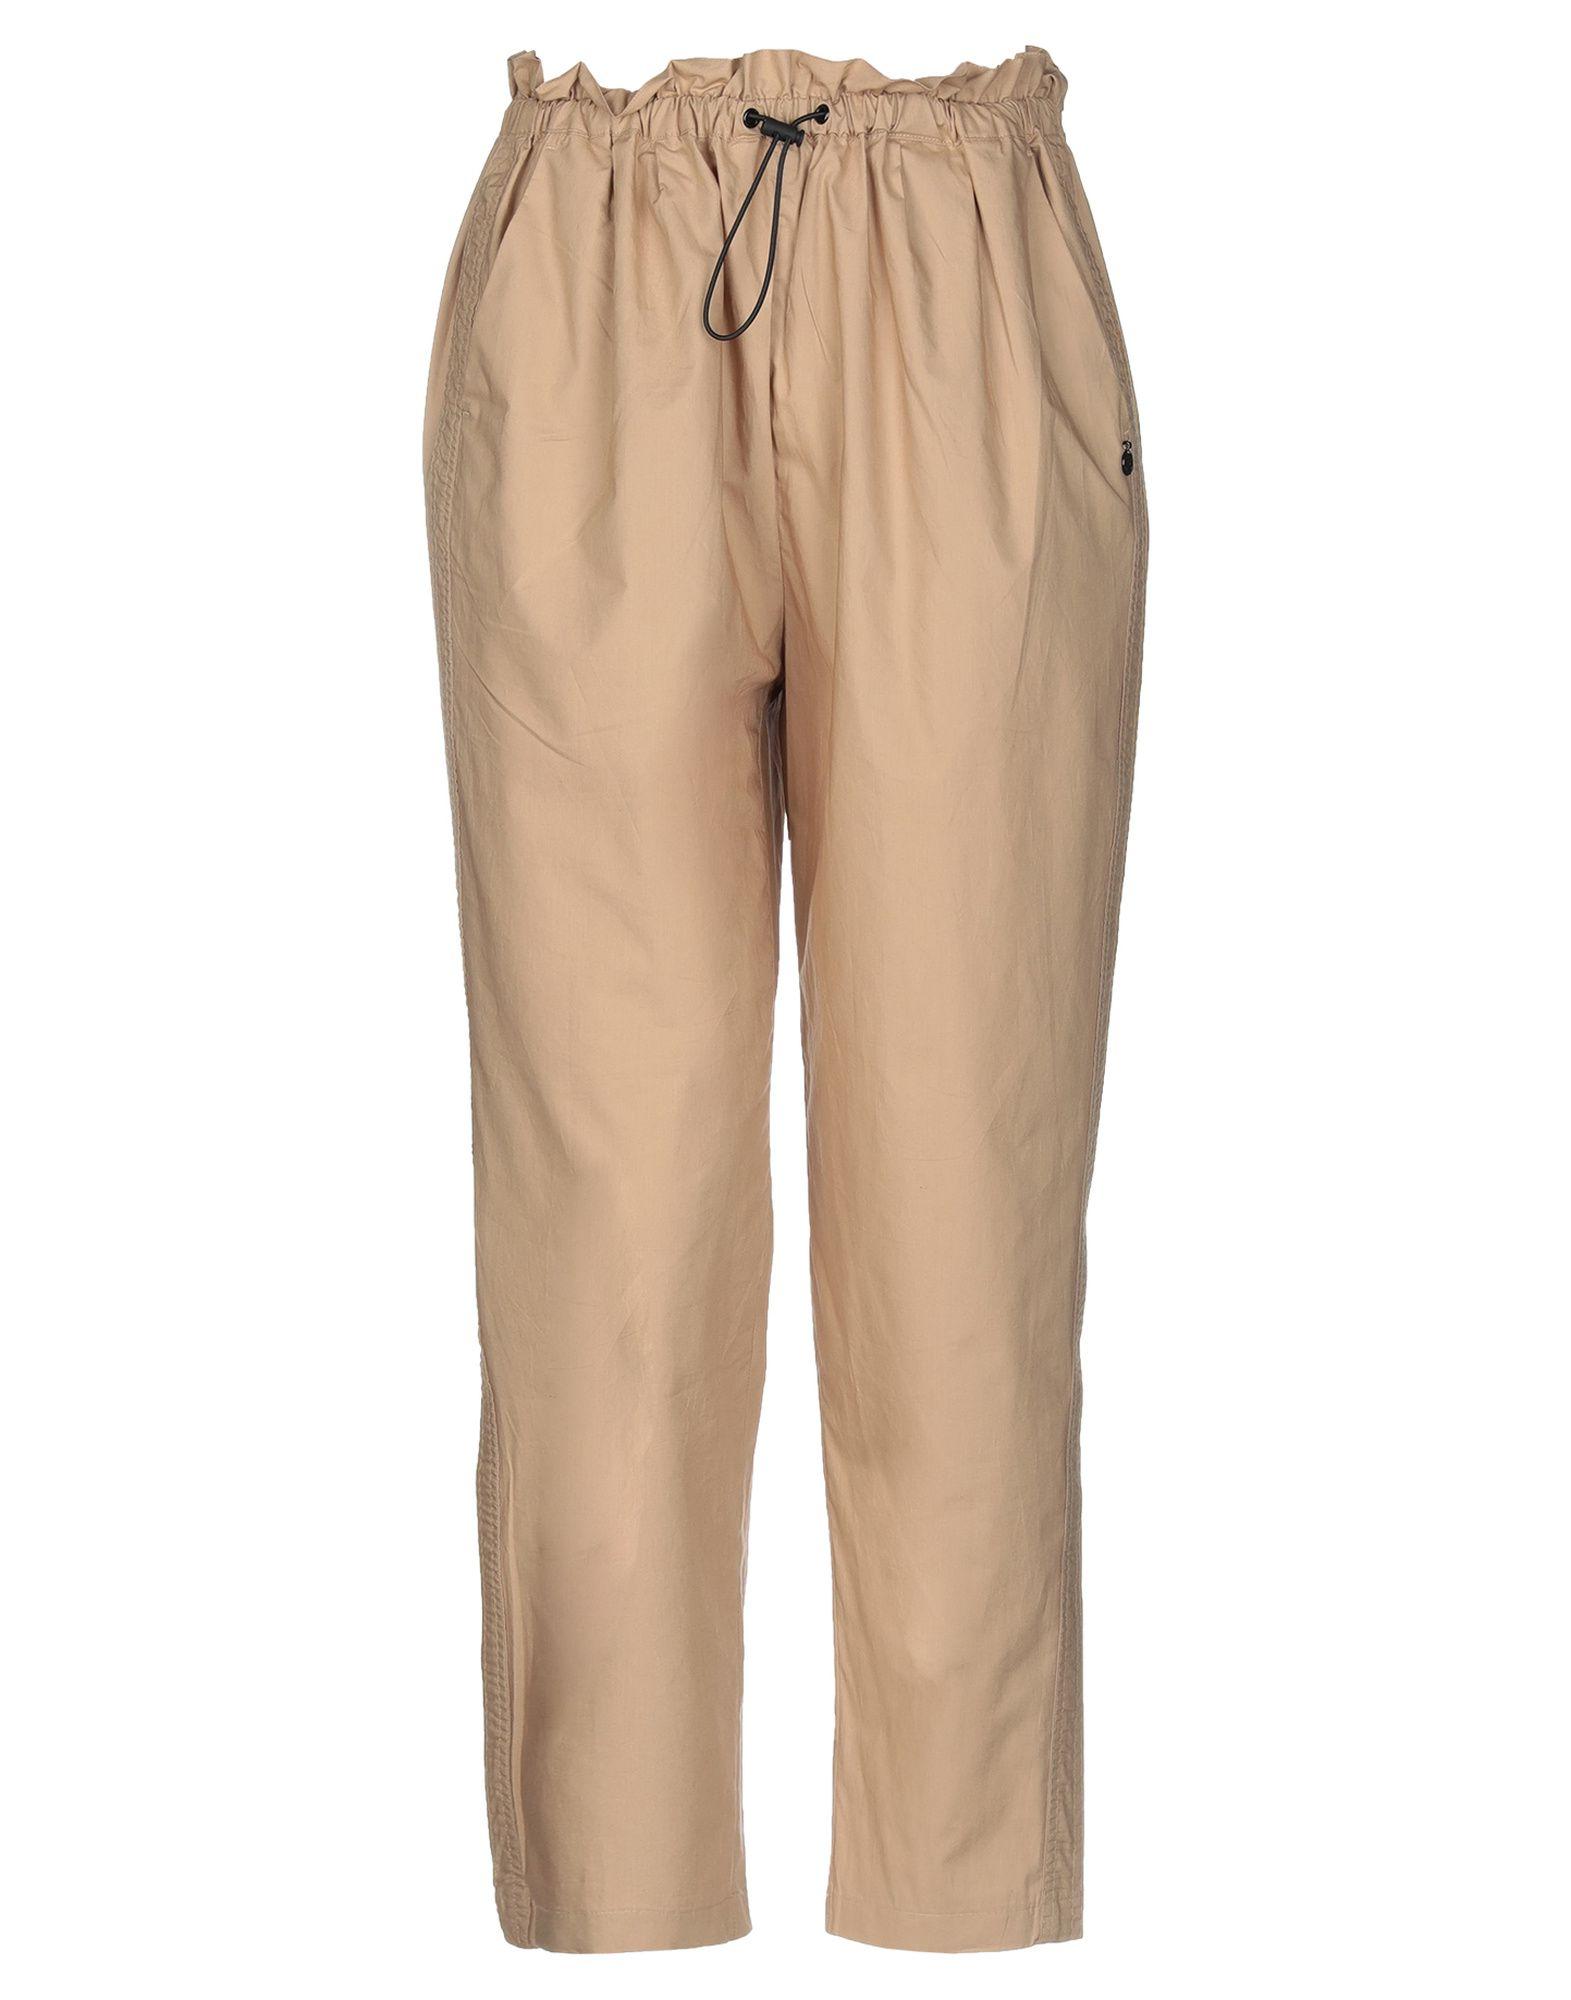 MAISON SCOTCH Повседневные брюки maison scotch повседневные брюки